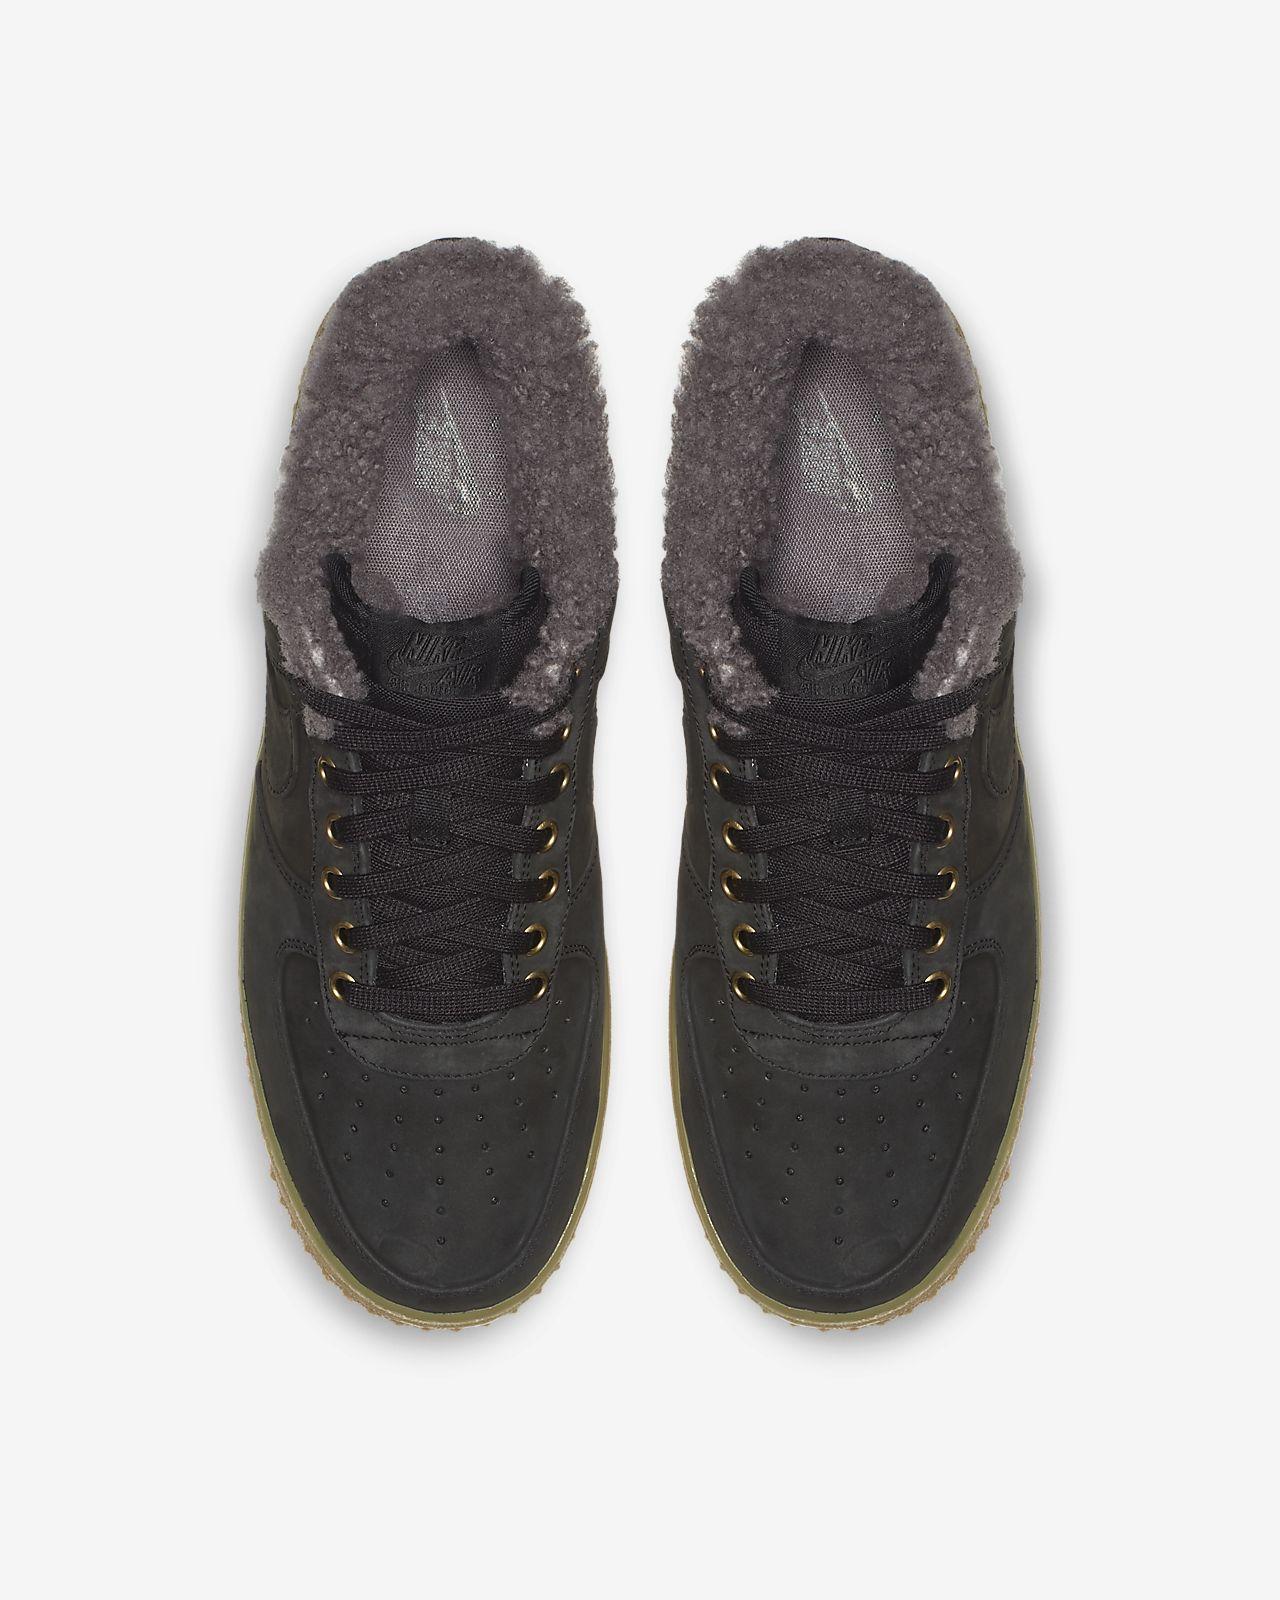 new product da455 ec1f8 ... Chaussure Nike Air Force 1 Premium Winter pour Homme